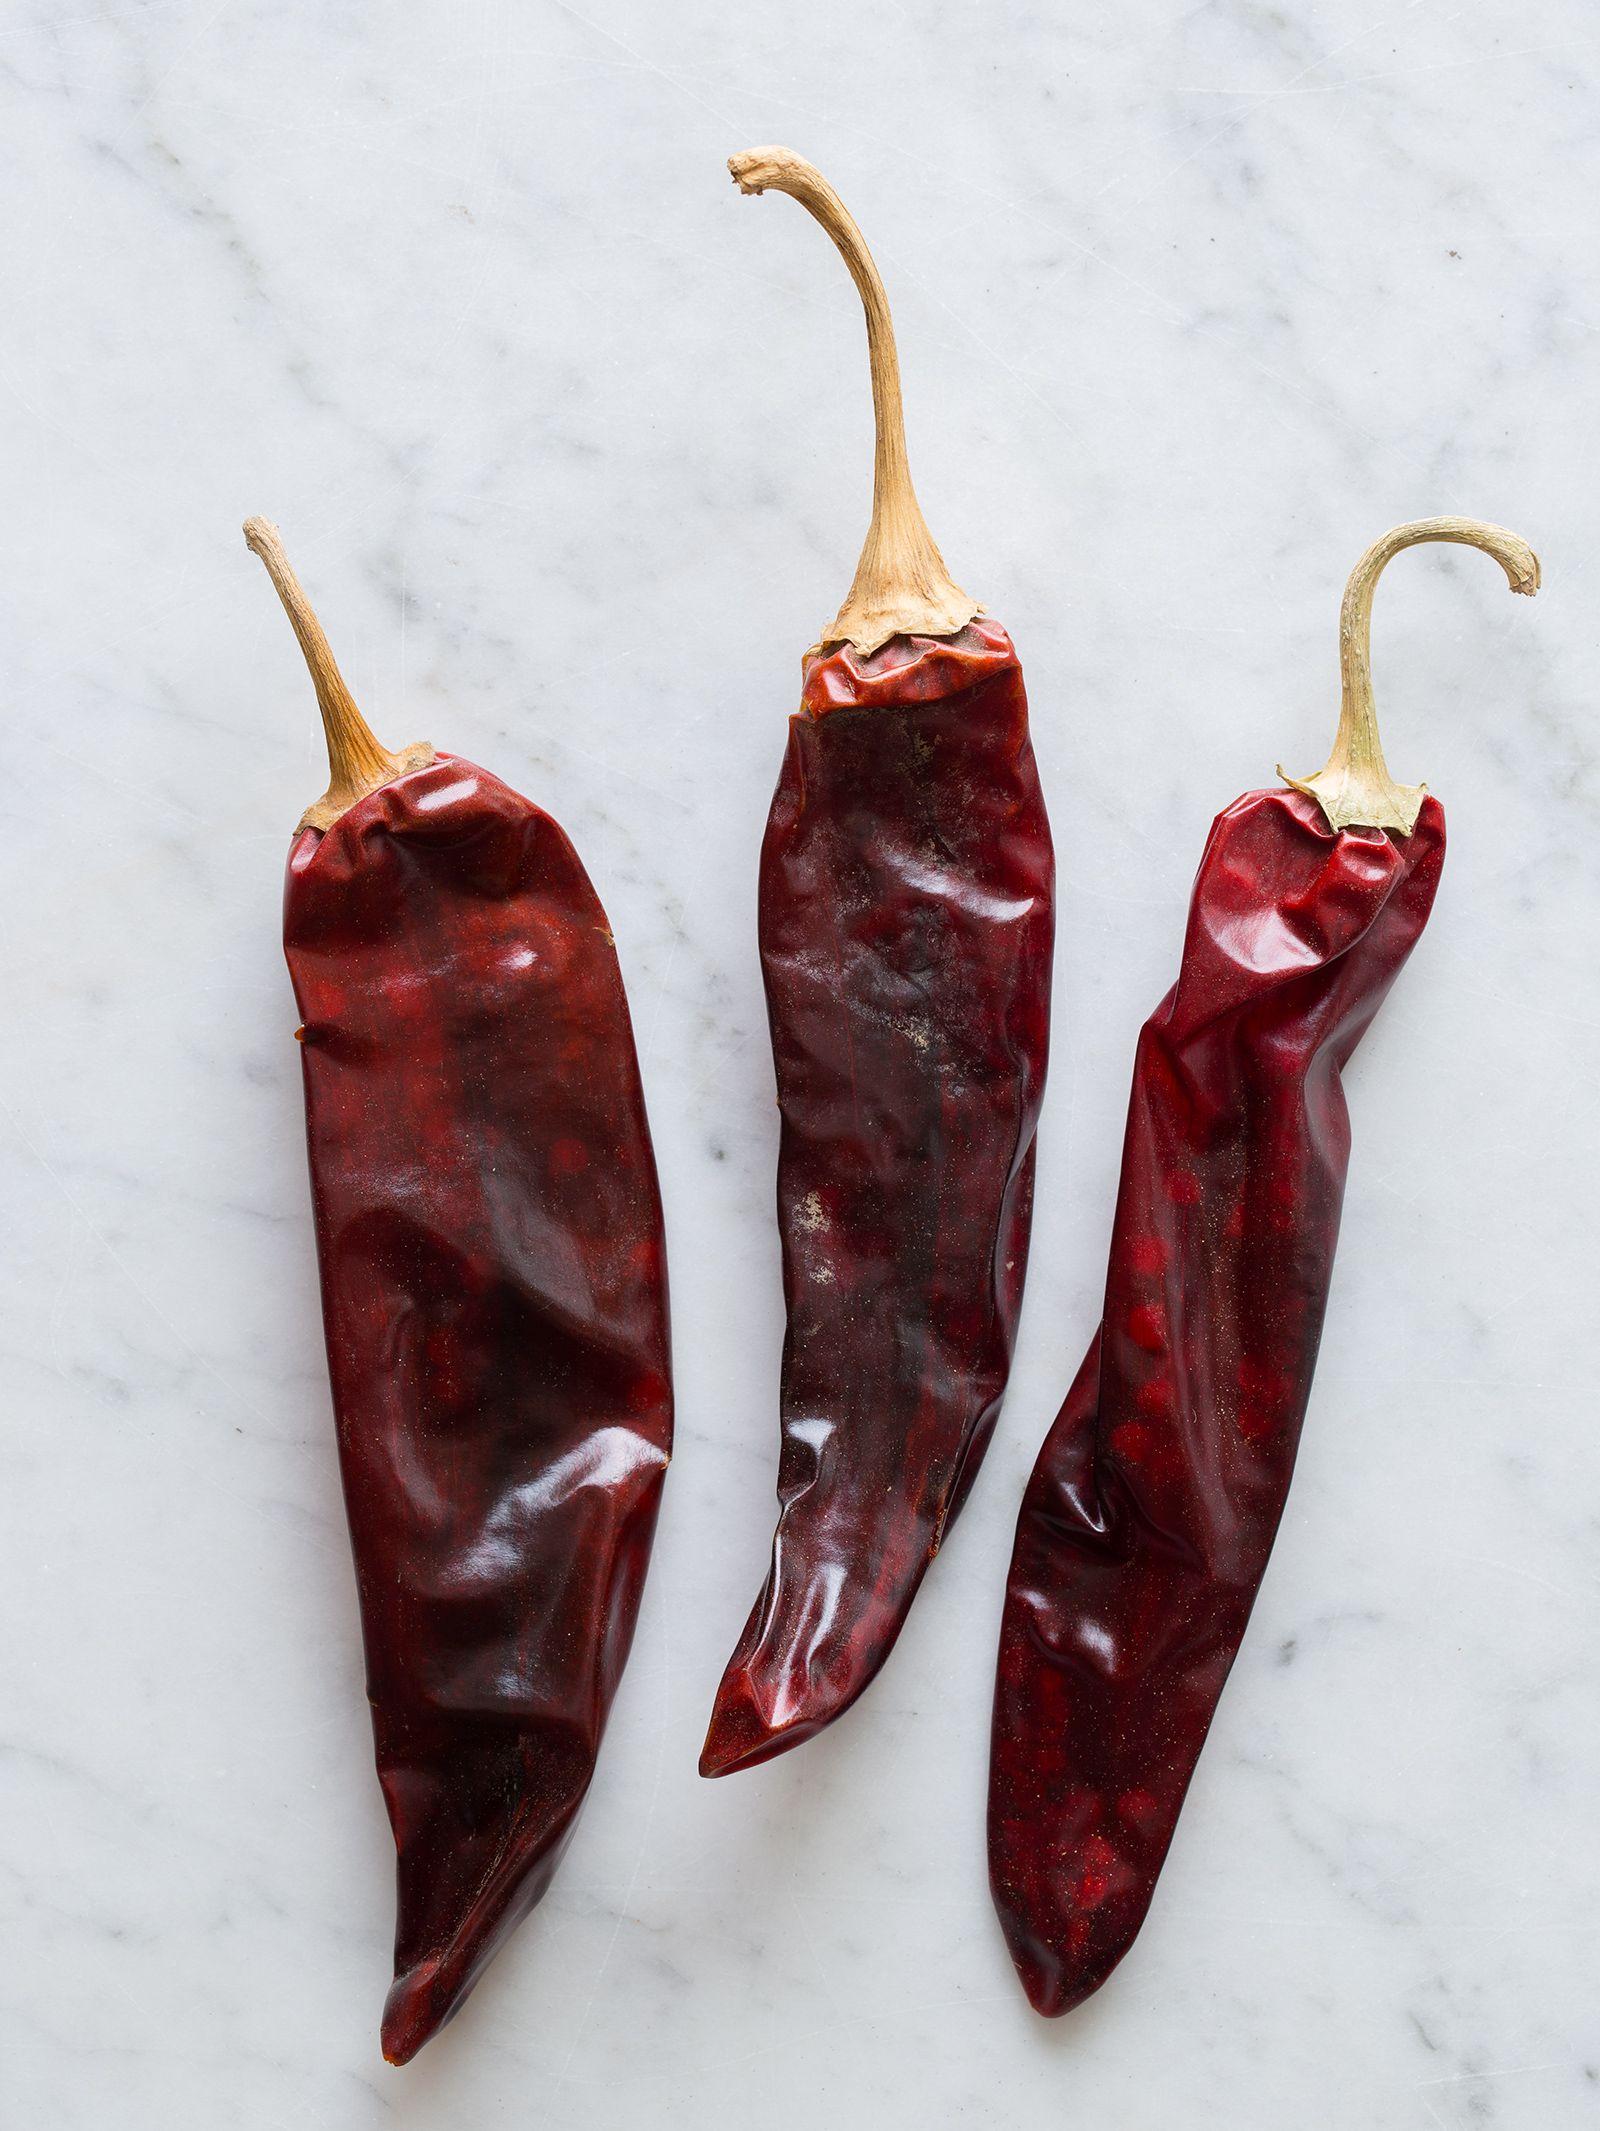 Guajillo Chiles for Homemade Harissa Two Ways